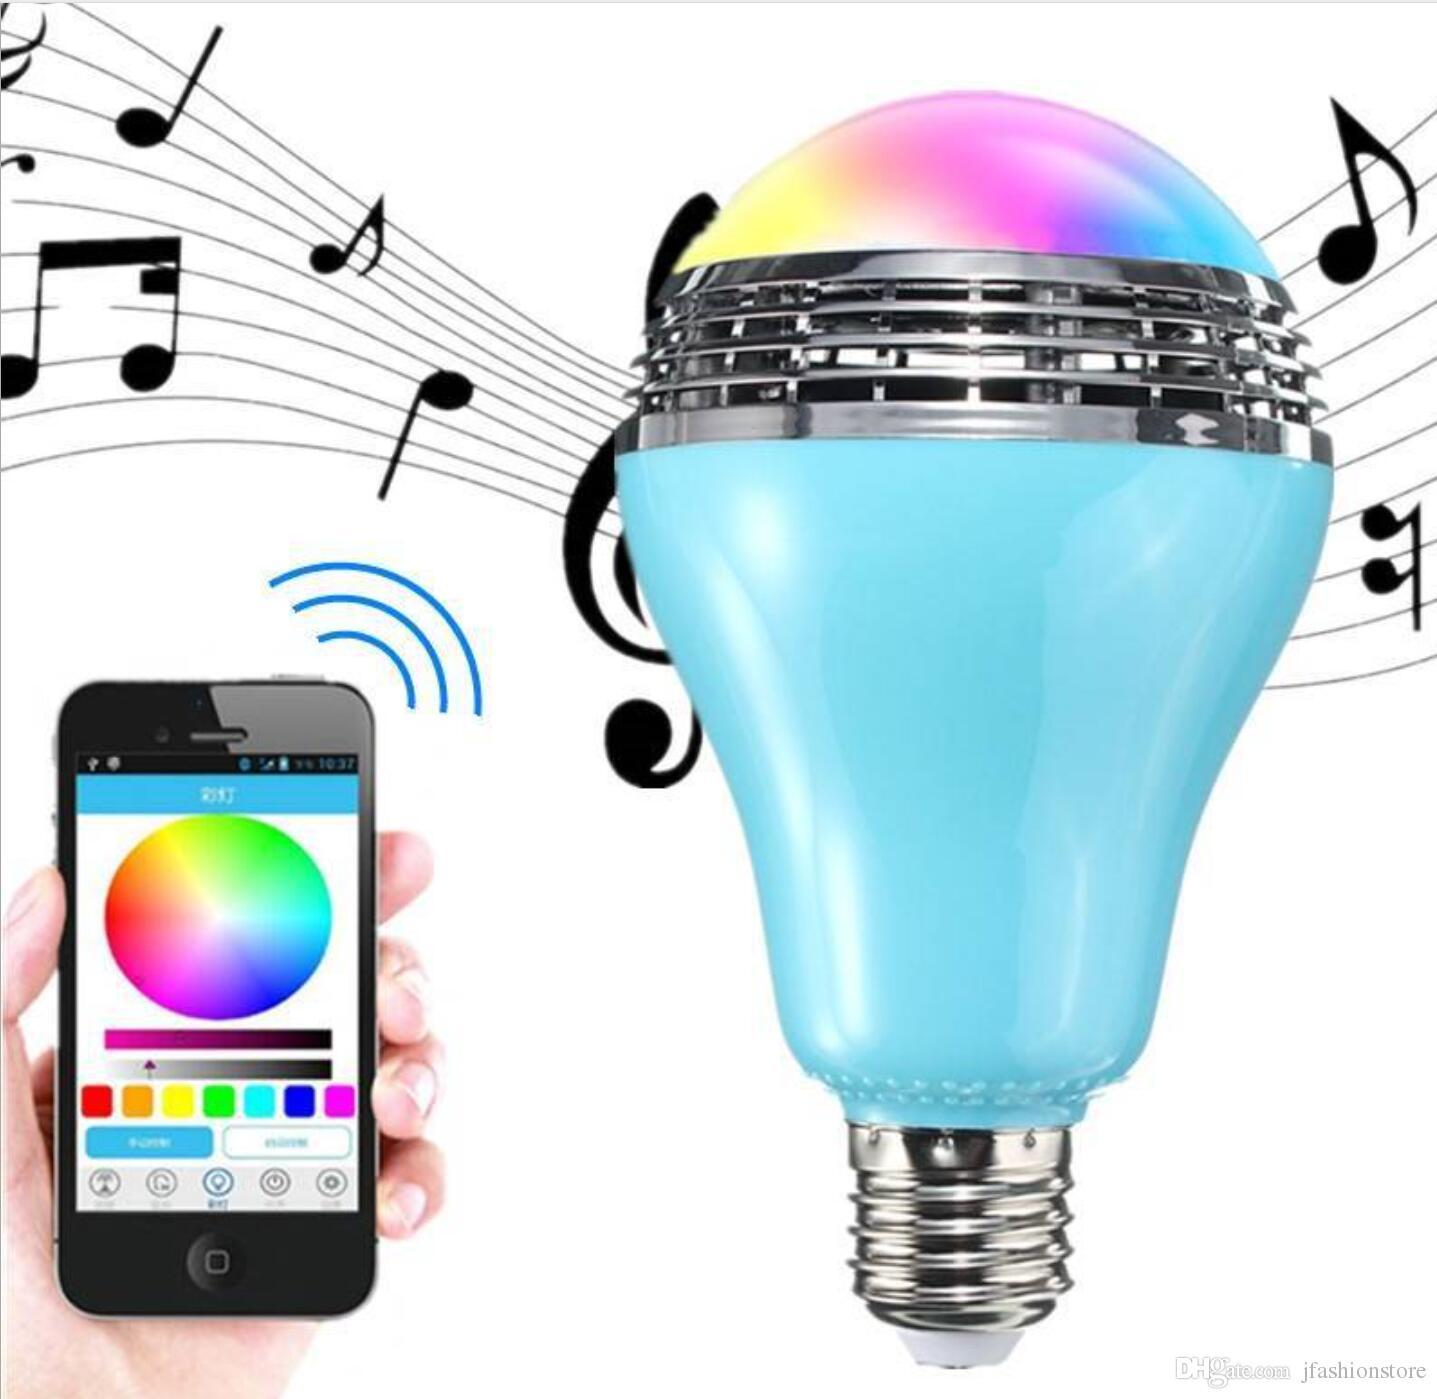 Magic wireless bluetooth bulb speaker for Bluetooth bulb